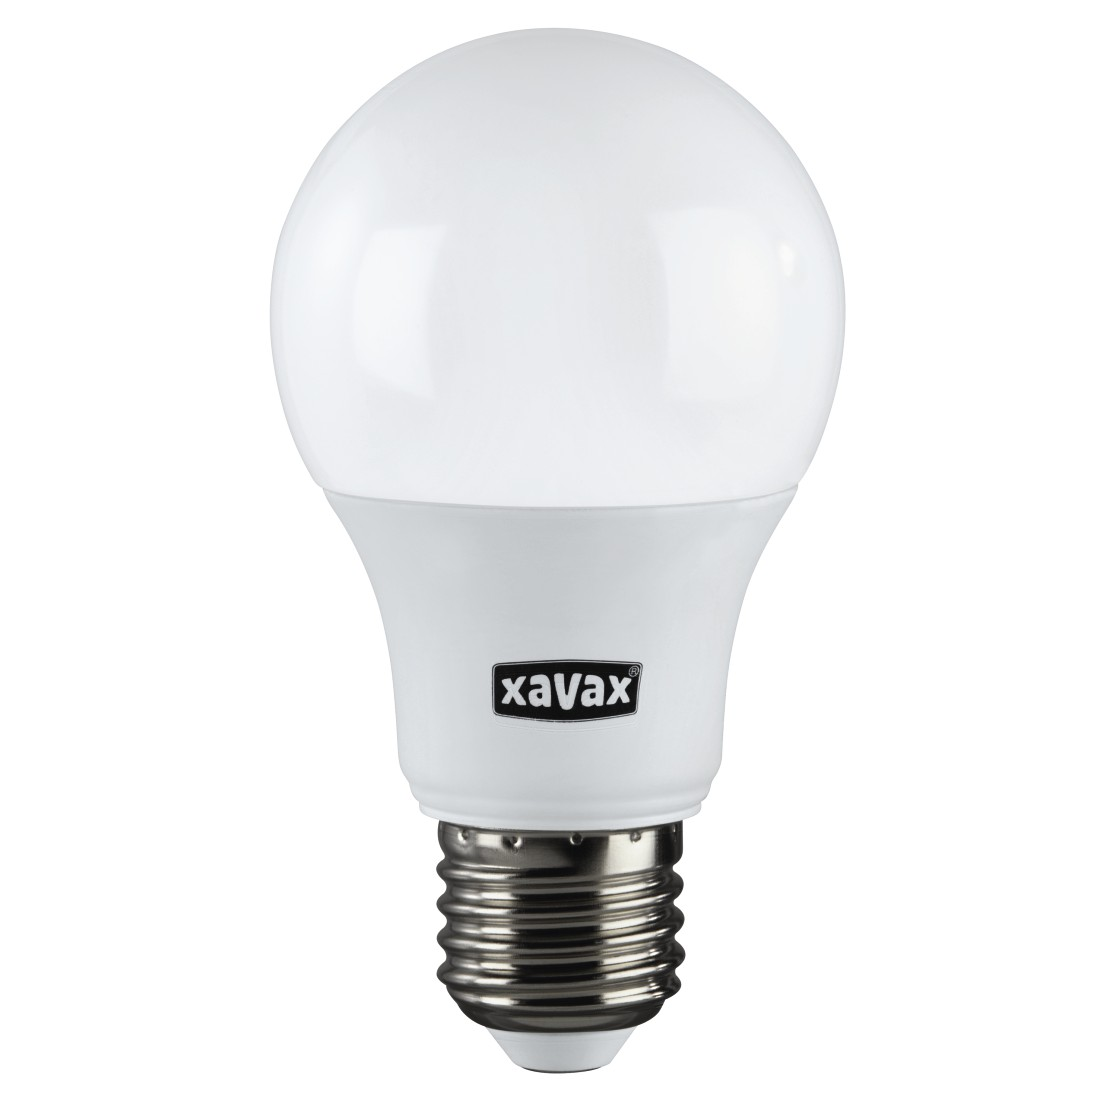 Xavax 00112501 xavax led lampe e27 806lm ersetzt 60w abx druckfhige abbildung xavax led lampe e27 806lm ersetzt 60w glhlampe parisarafo Images